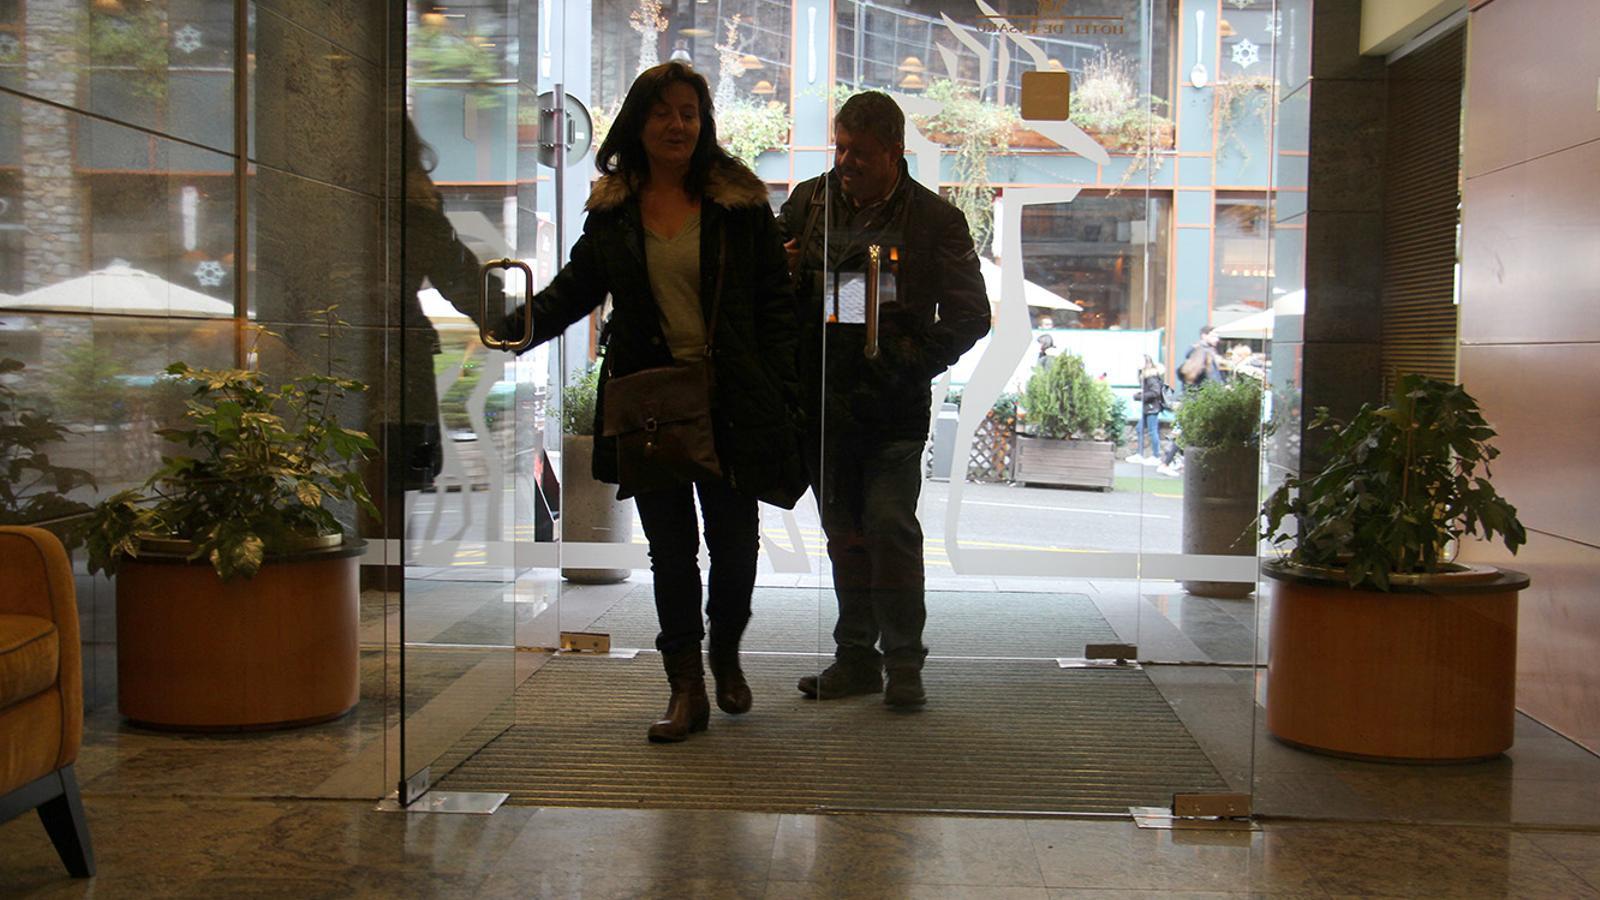 Turistes entrant a l'hotel Isard aquest dissabte / M.G.C.